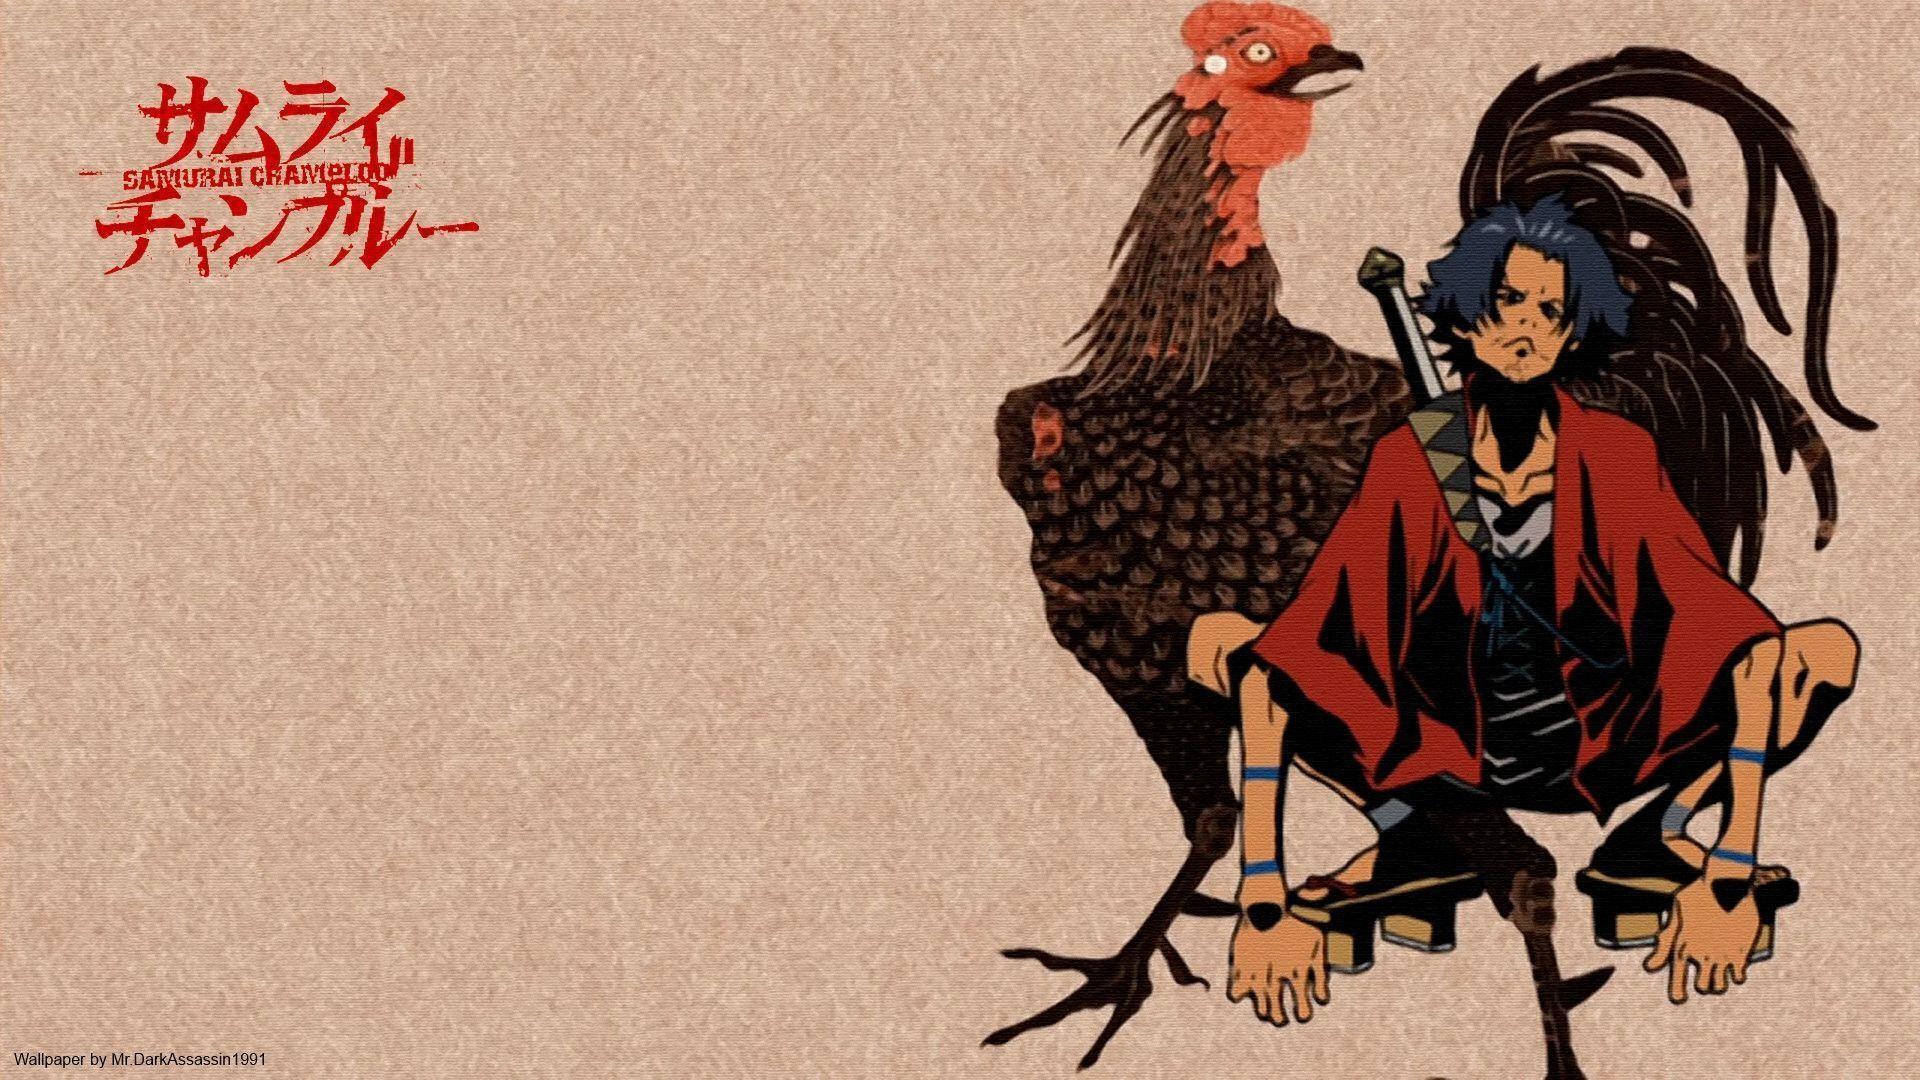 Res: 1920x1080, Samurai Champloo Mugen Fight - Viewing Gallery